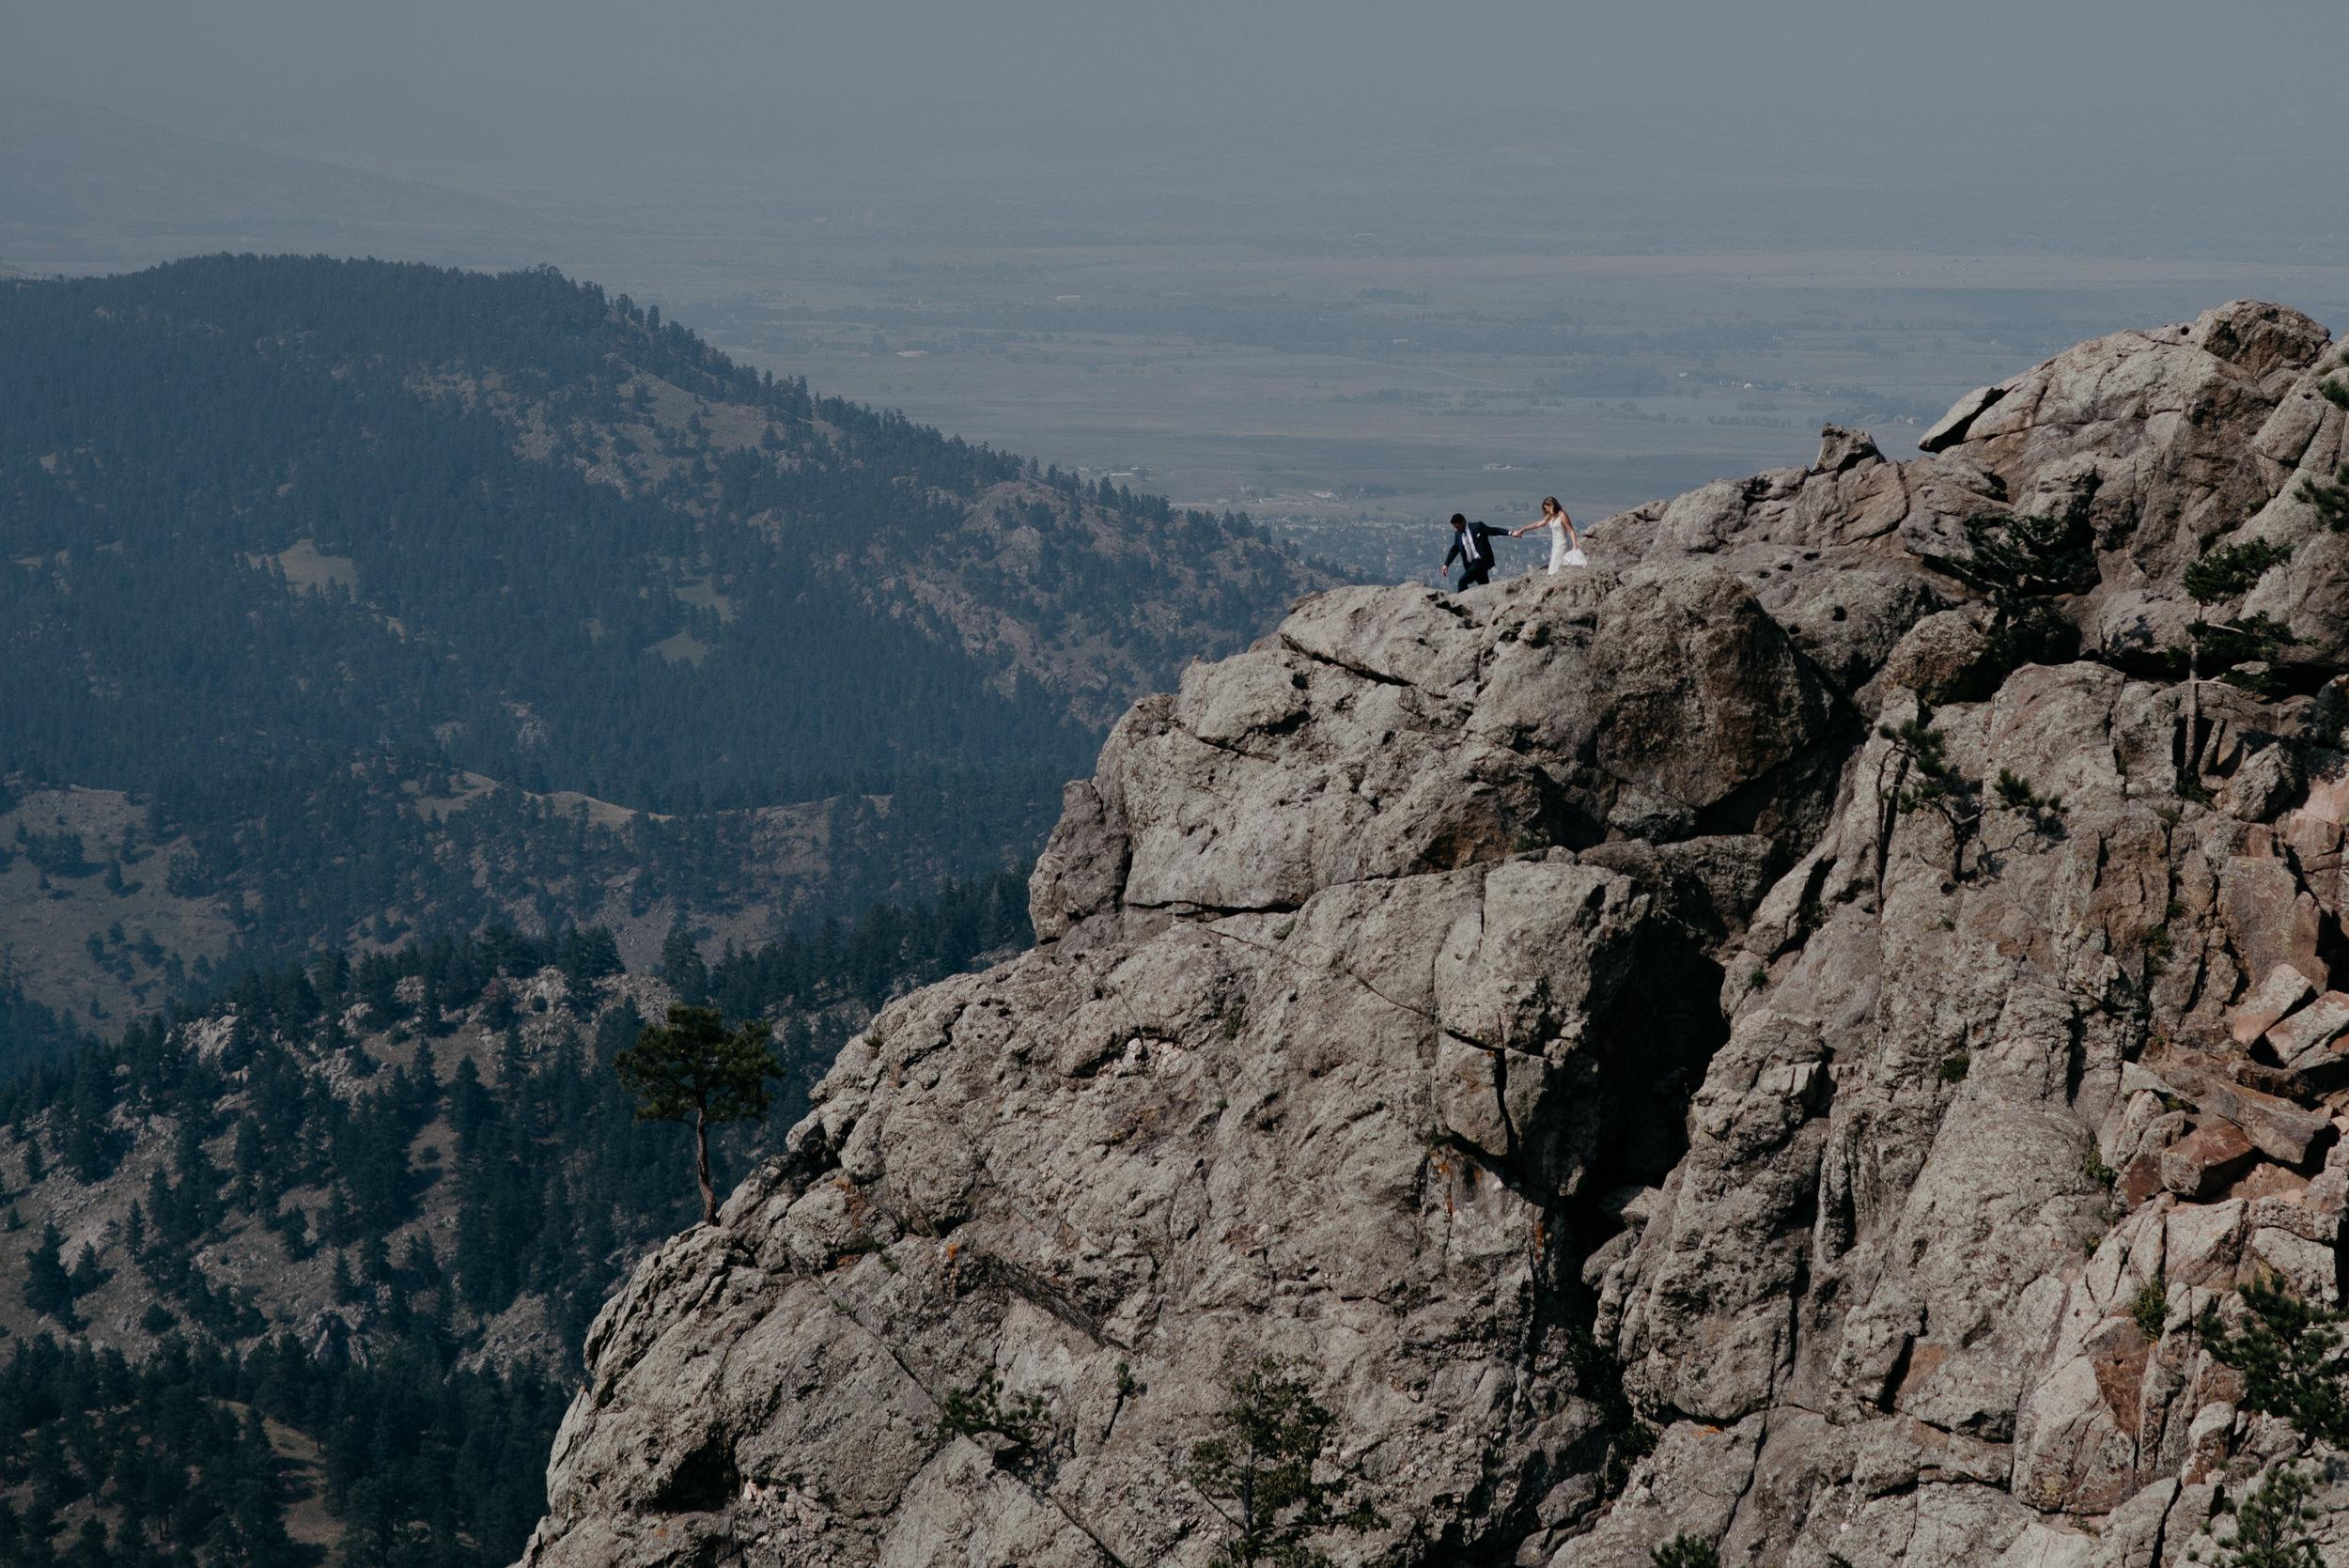 Mountaintop elopement in Boulder, Colorado. Colorado adventure elopement photographer.